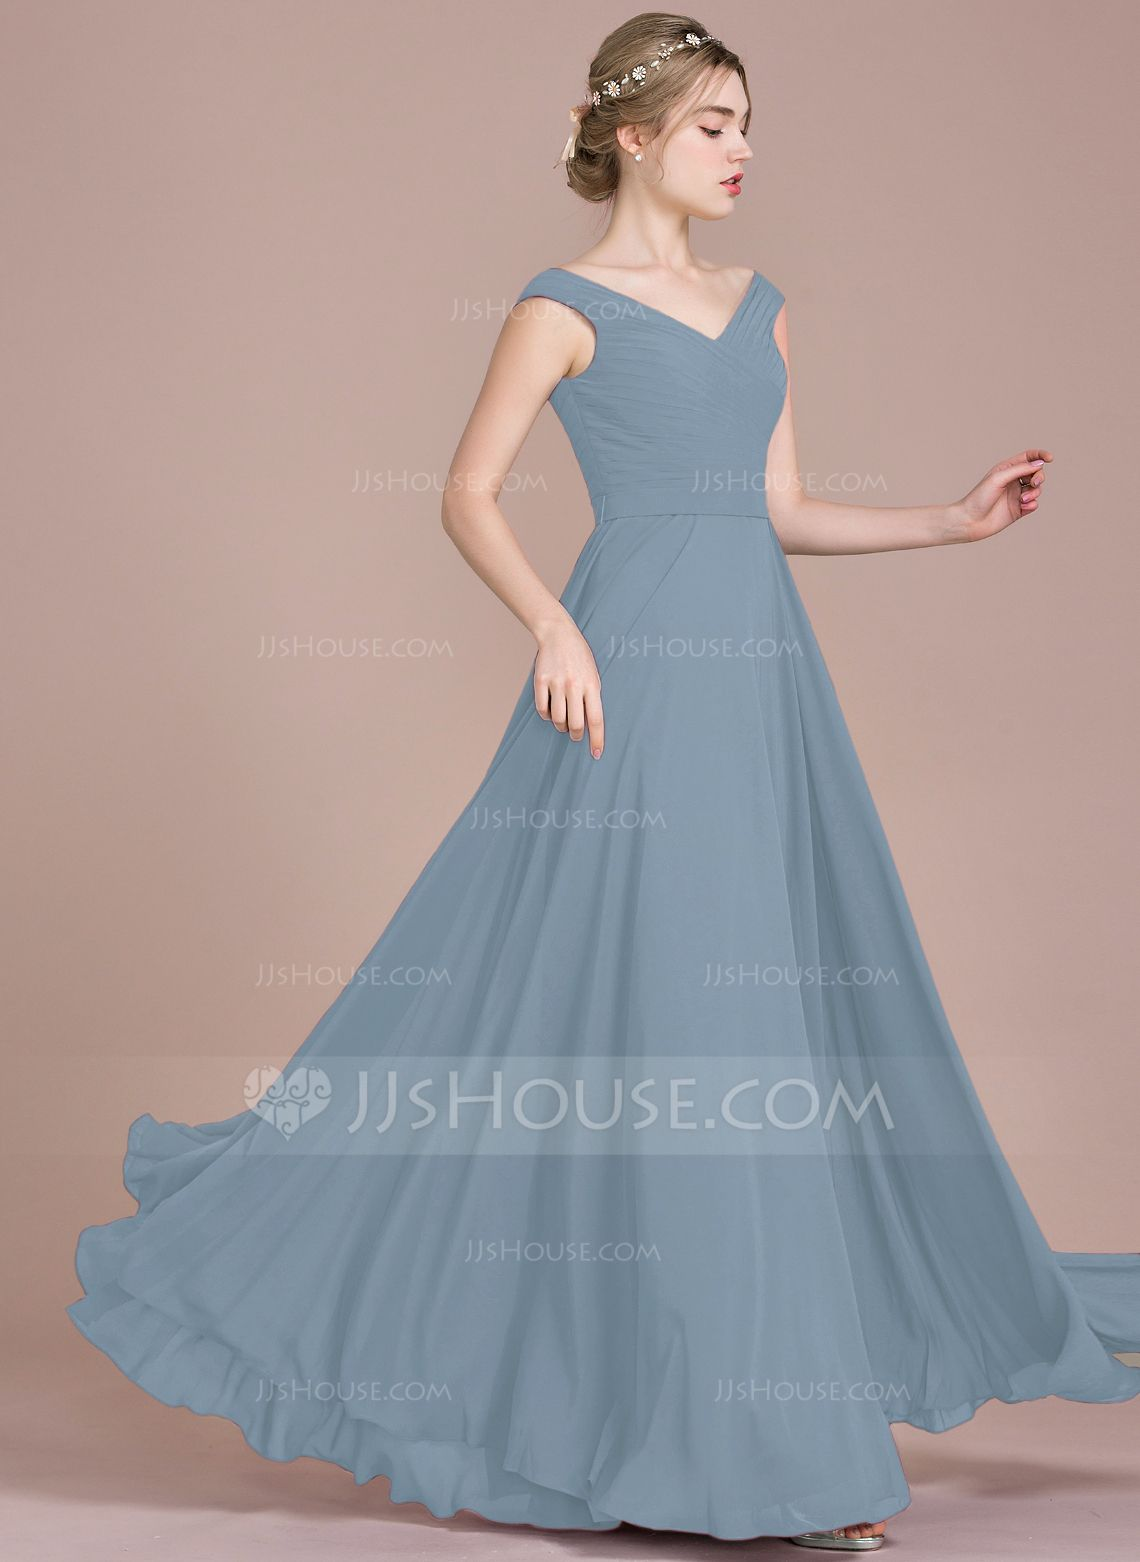 1e984aebe35 A-Line Princess Off-the-Shoulder Floor-Length Chiffon Bridesmaid Dress With  Ruffle (007104732) - Bridesmaid Dresses - JJ s House